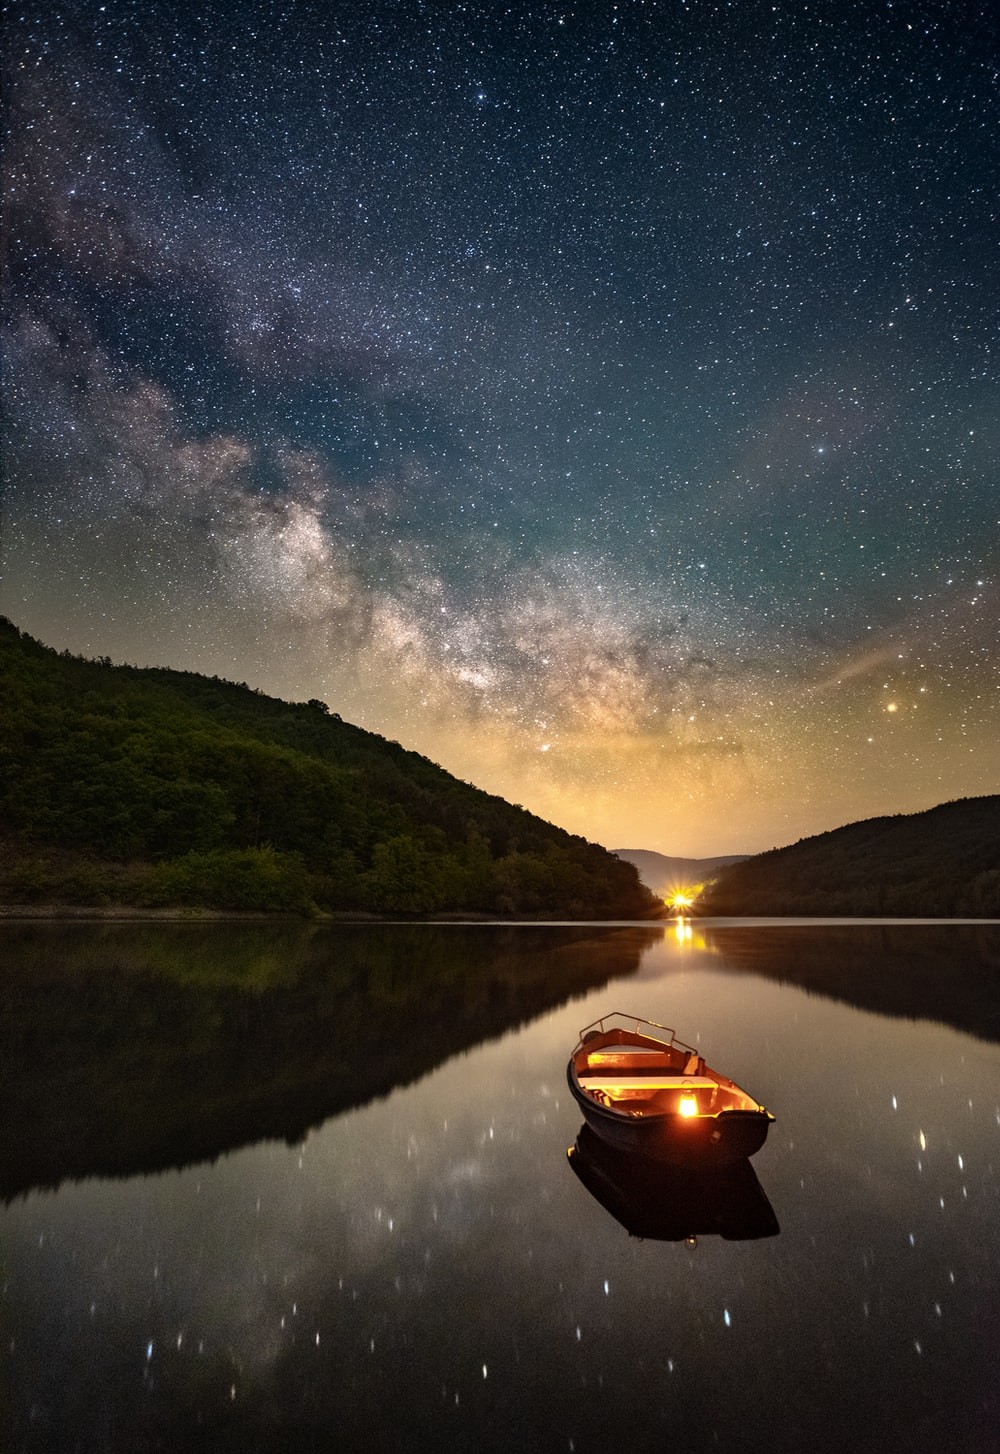 boat on lake near mountain during night time